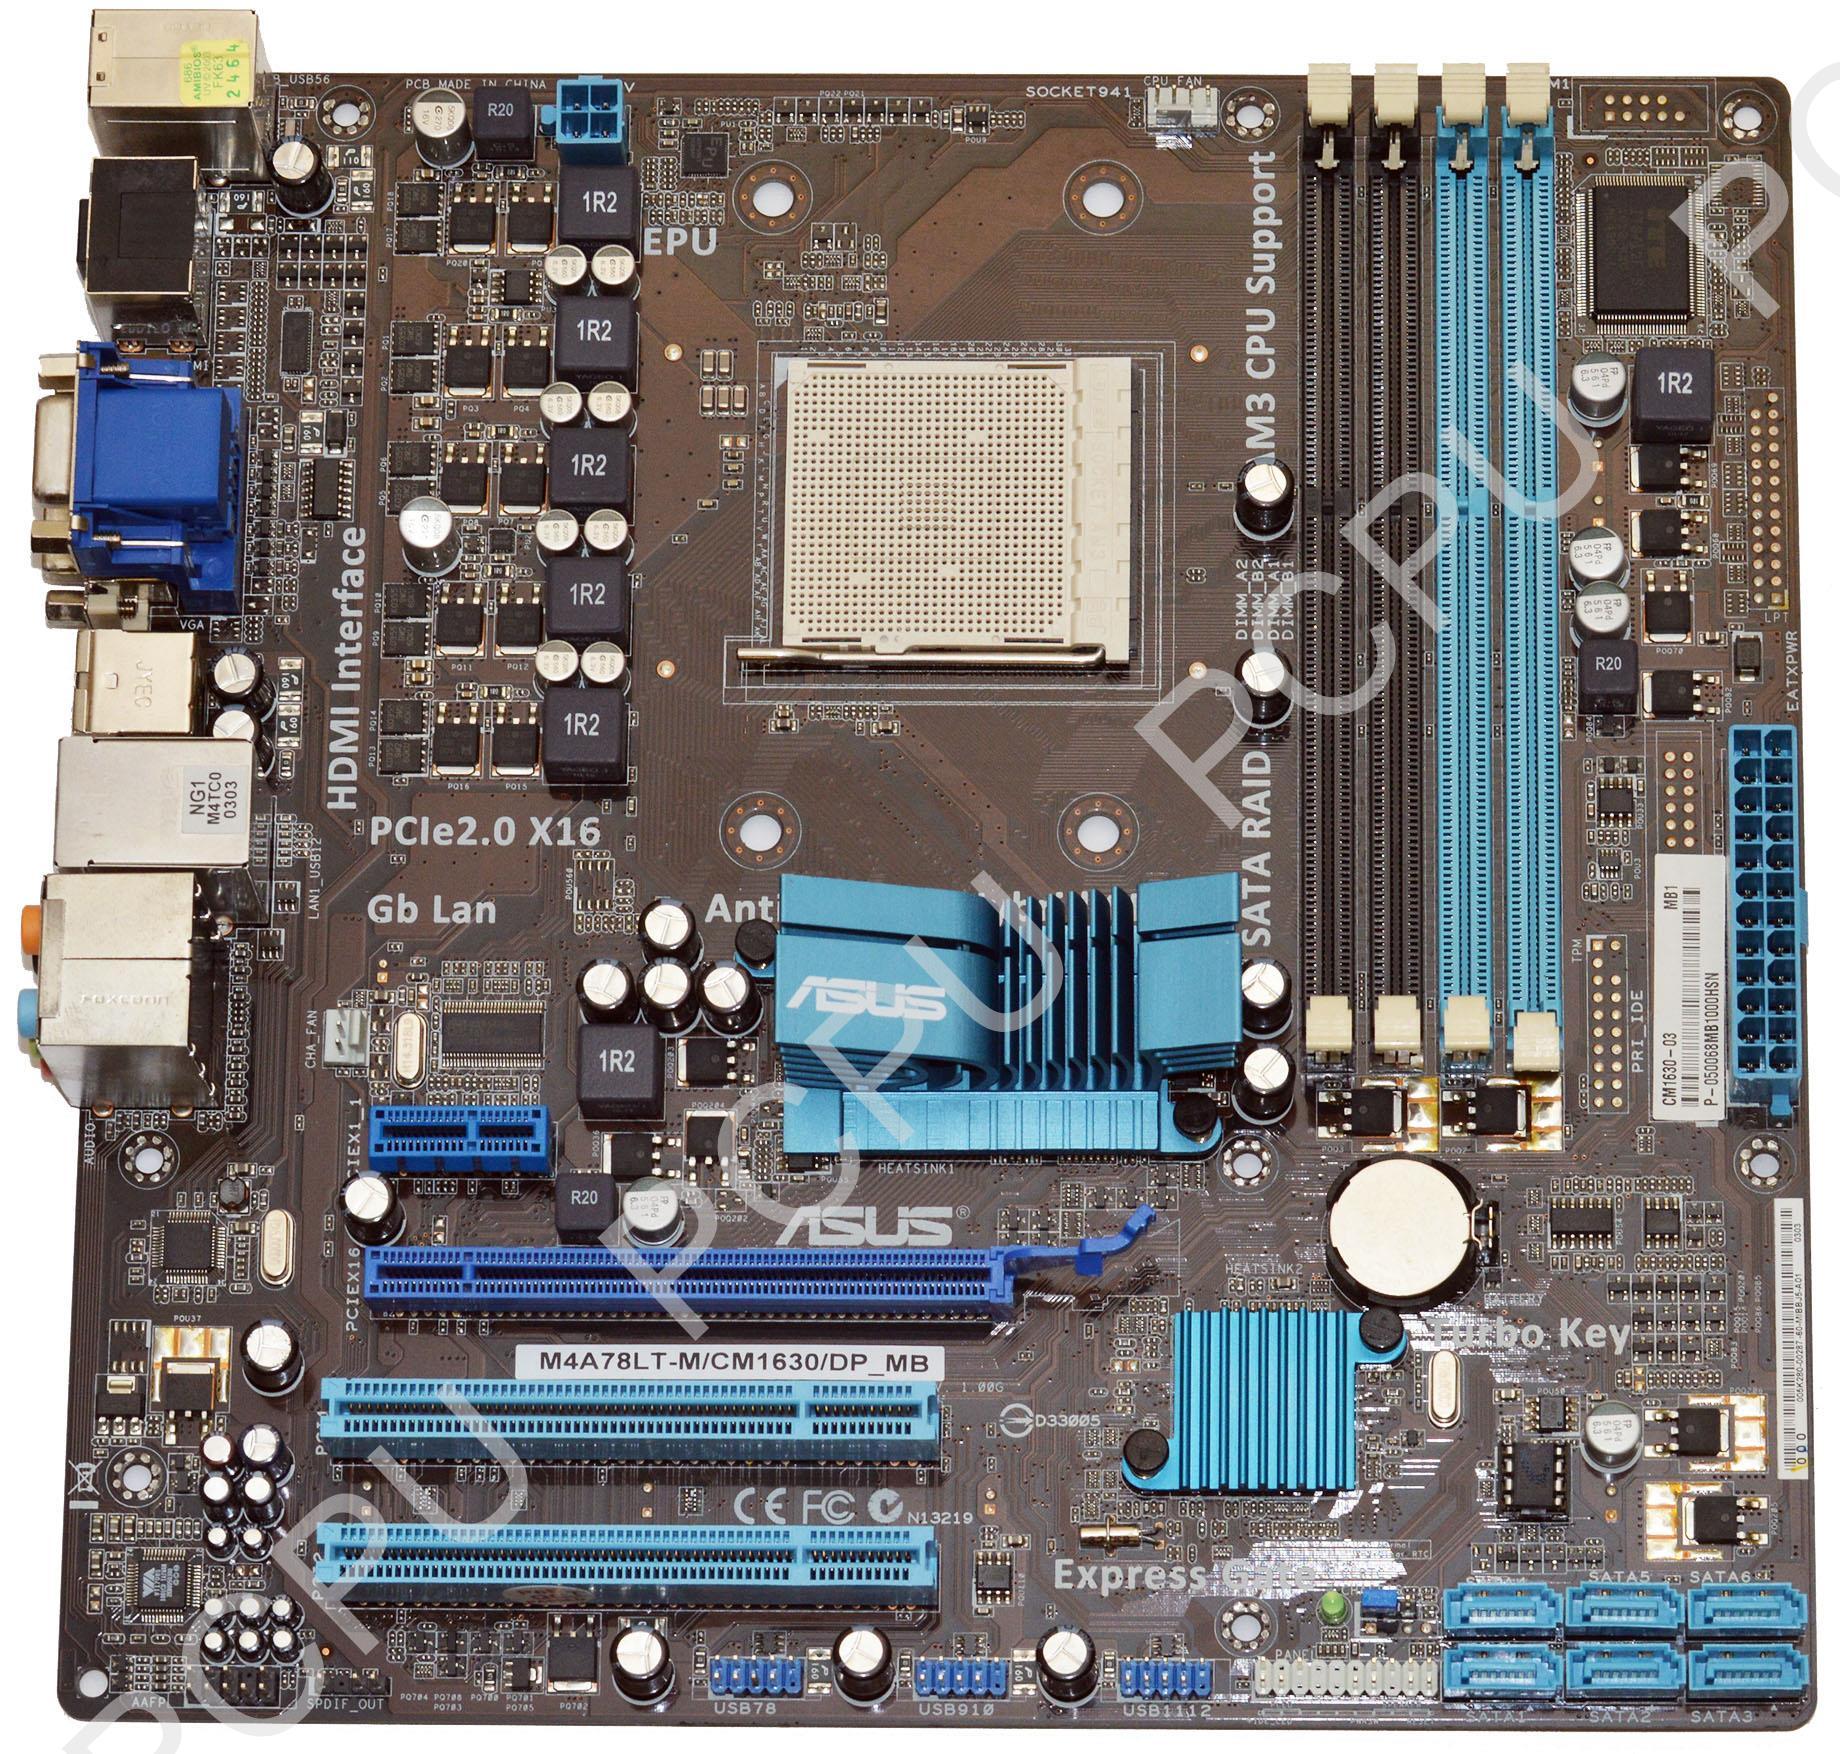 ASUS 61-MIBBJ5-01 ASUS Essentio CM1630 AMD Desktop Motherboard AM3